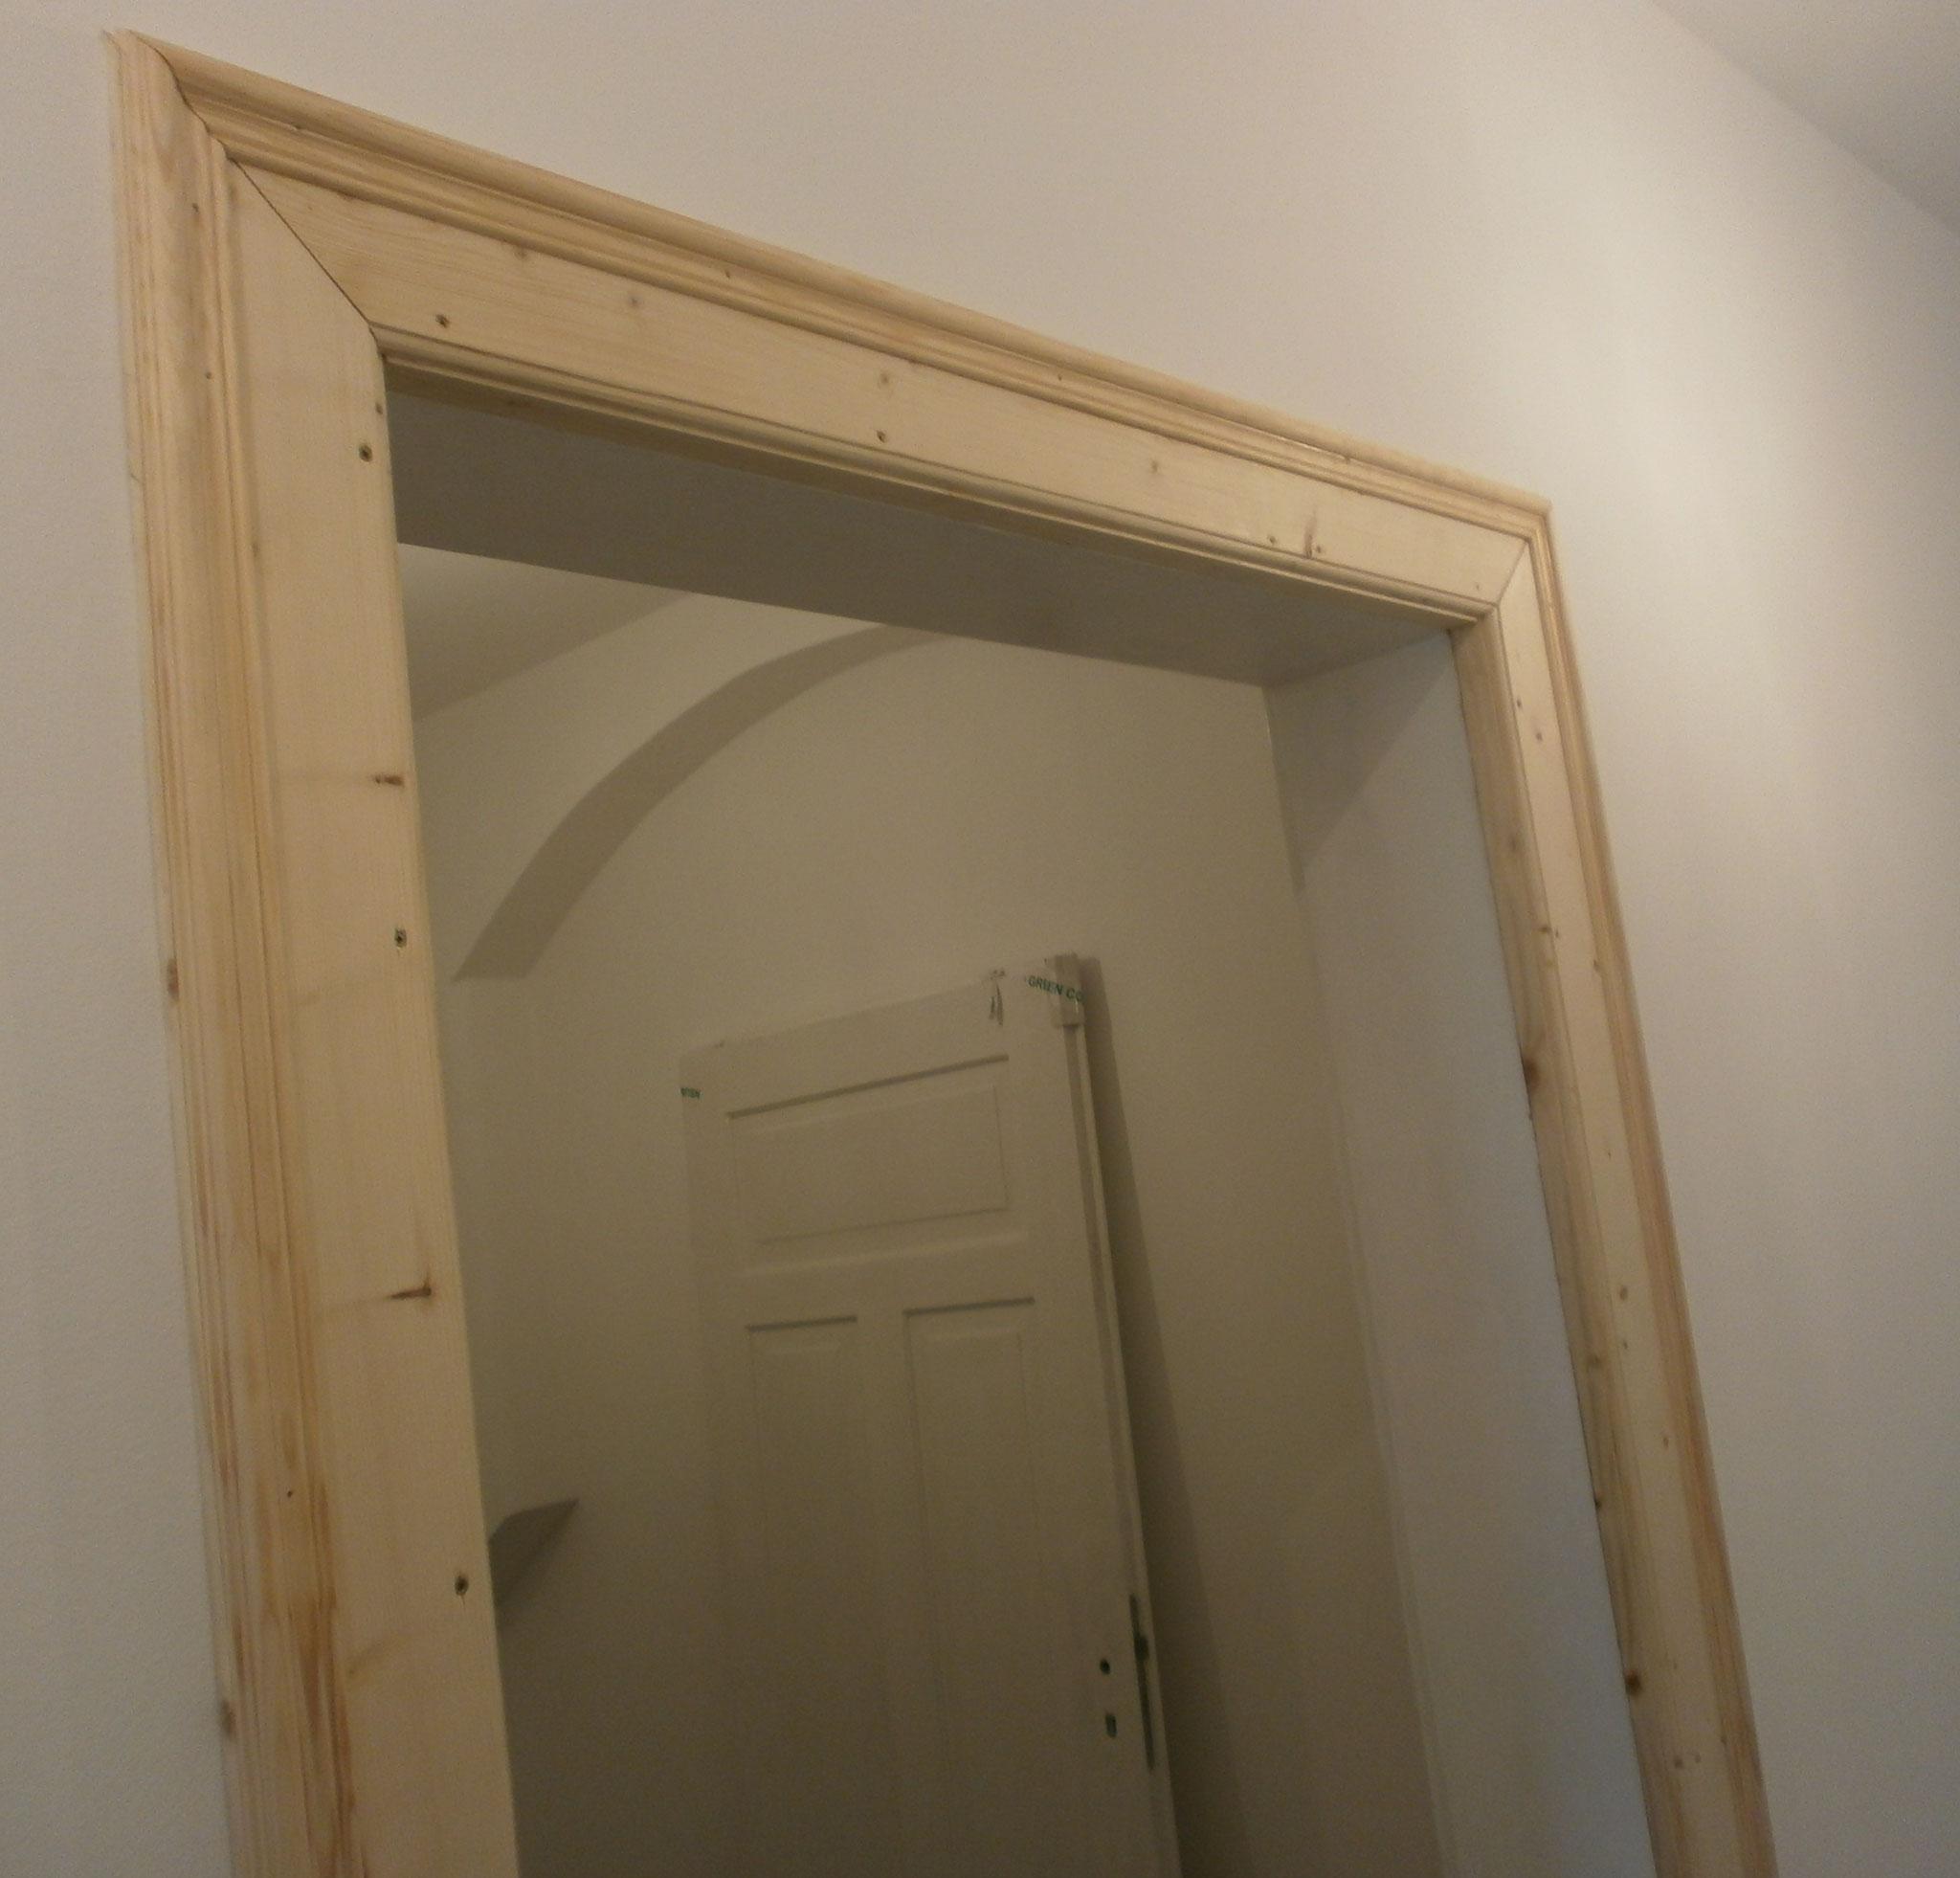 Erneuerung Holztürrahmen